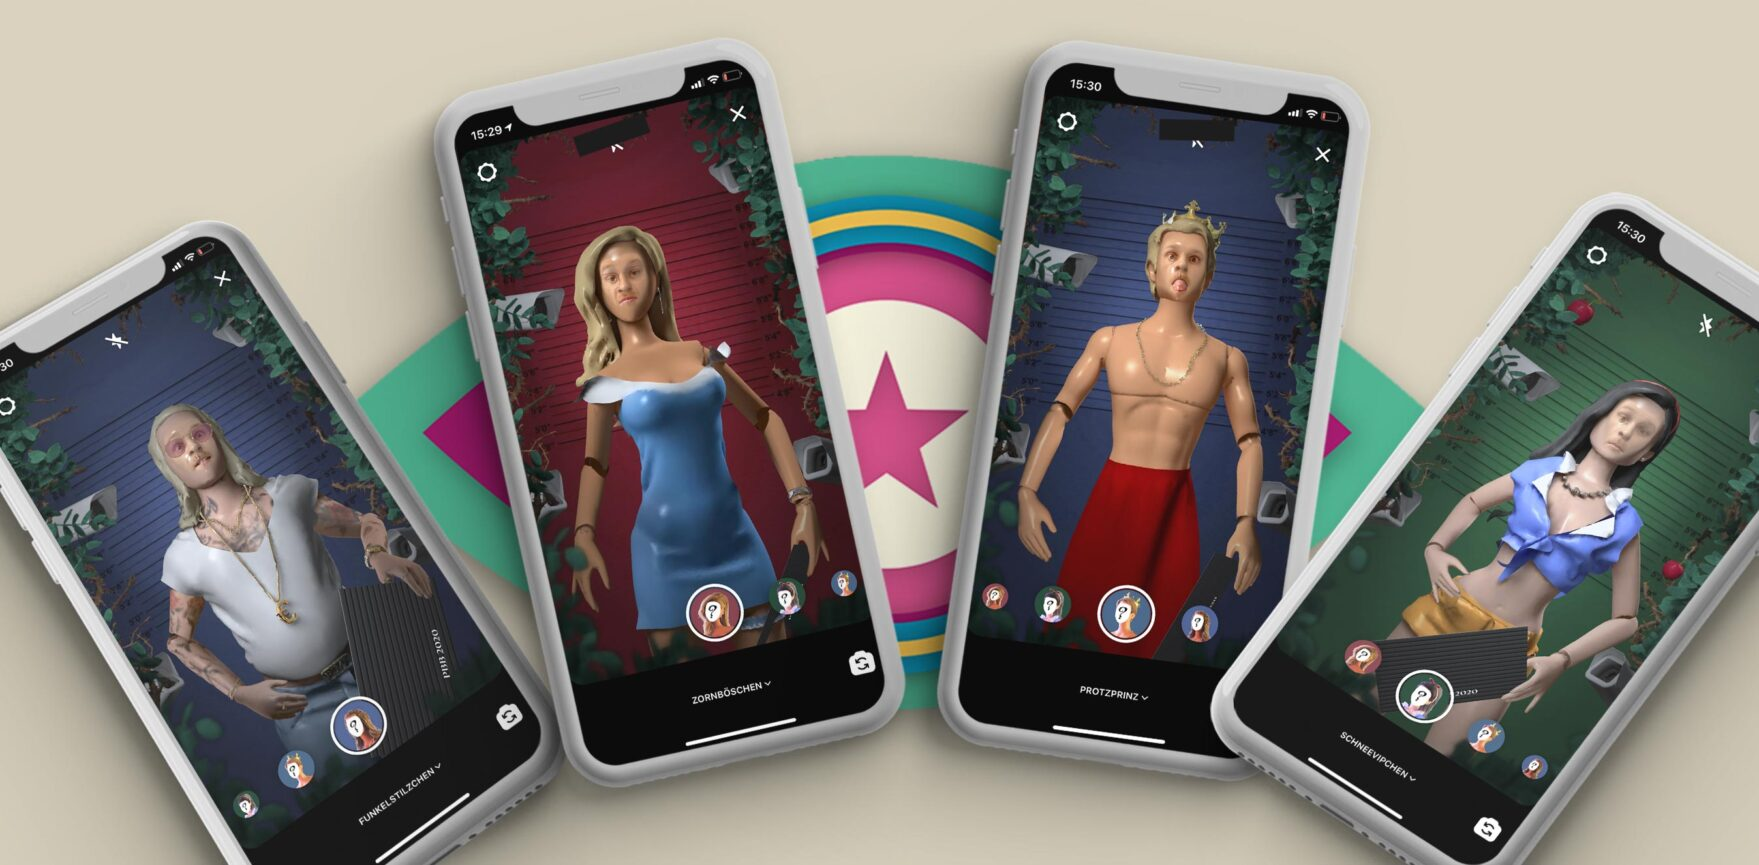 Promi Big Brother Facefilter Smartphone